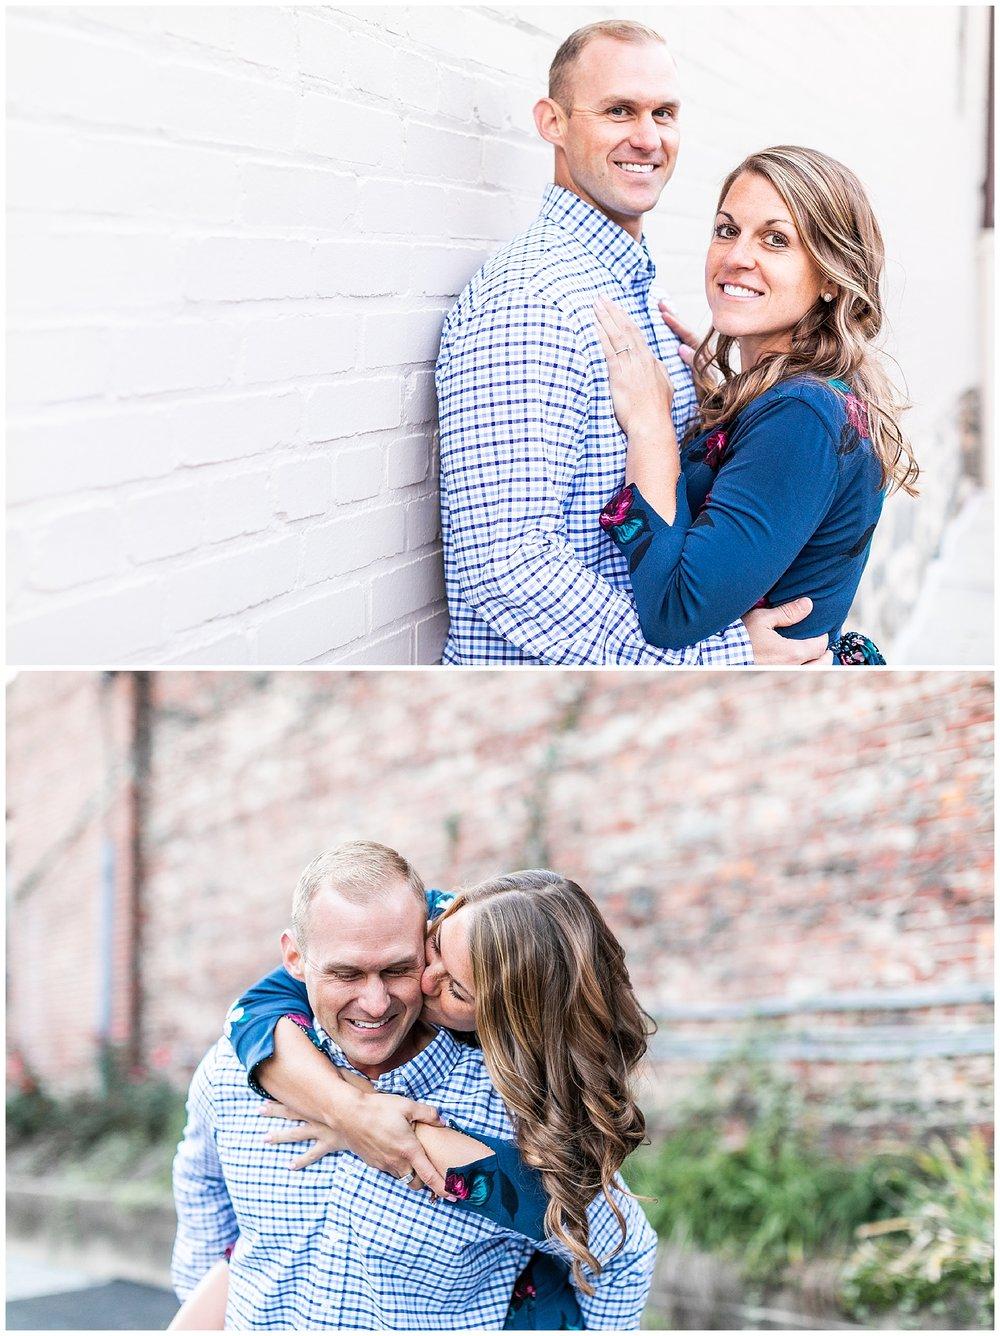 LaurenKyleEllicottCityEngagementSessionLivingRadiantPhotographyphotos_0031.jpg